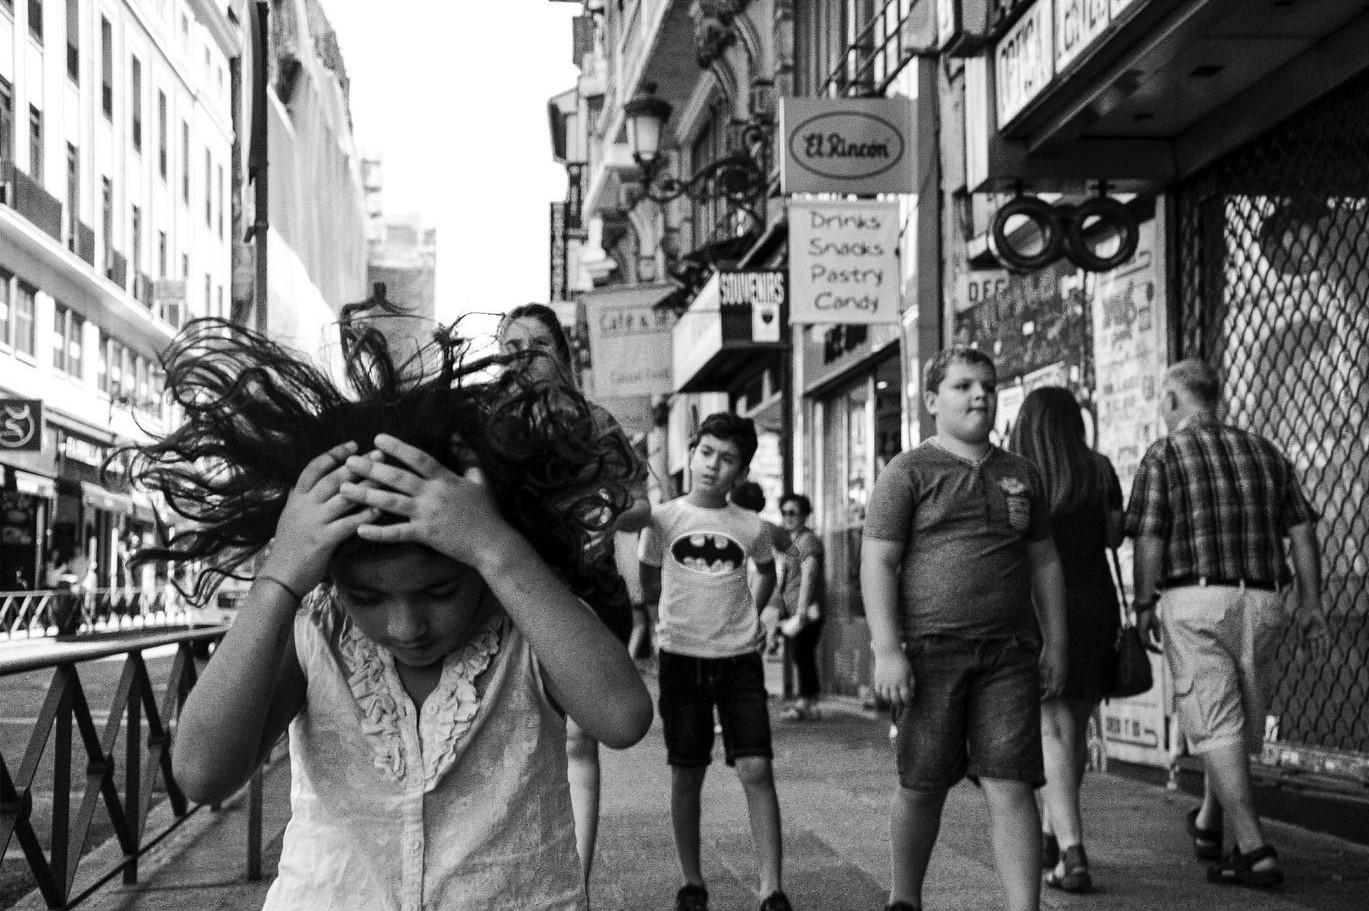 @pelodefanta_streets